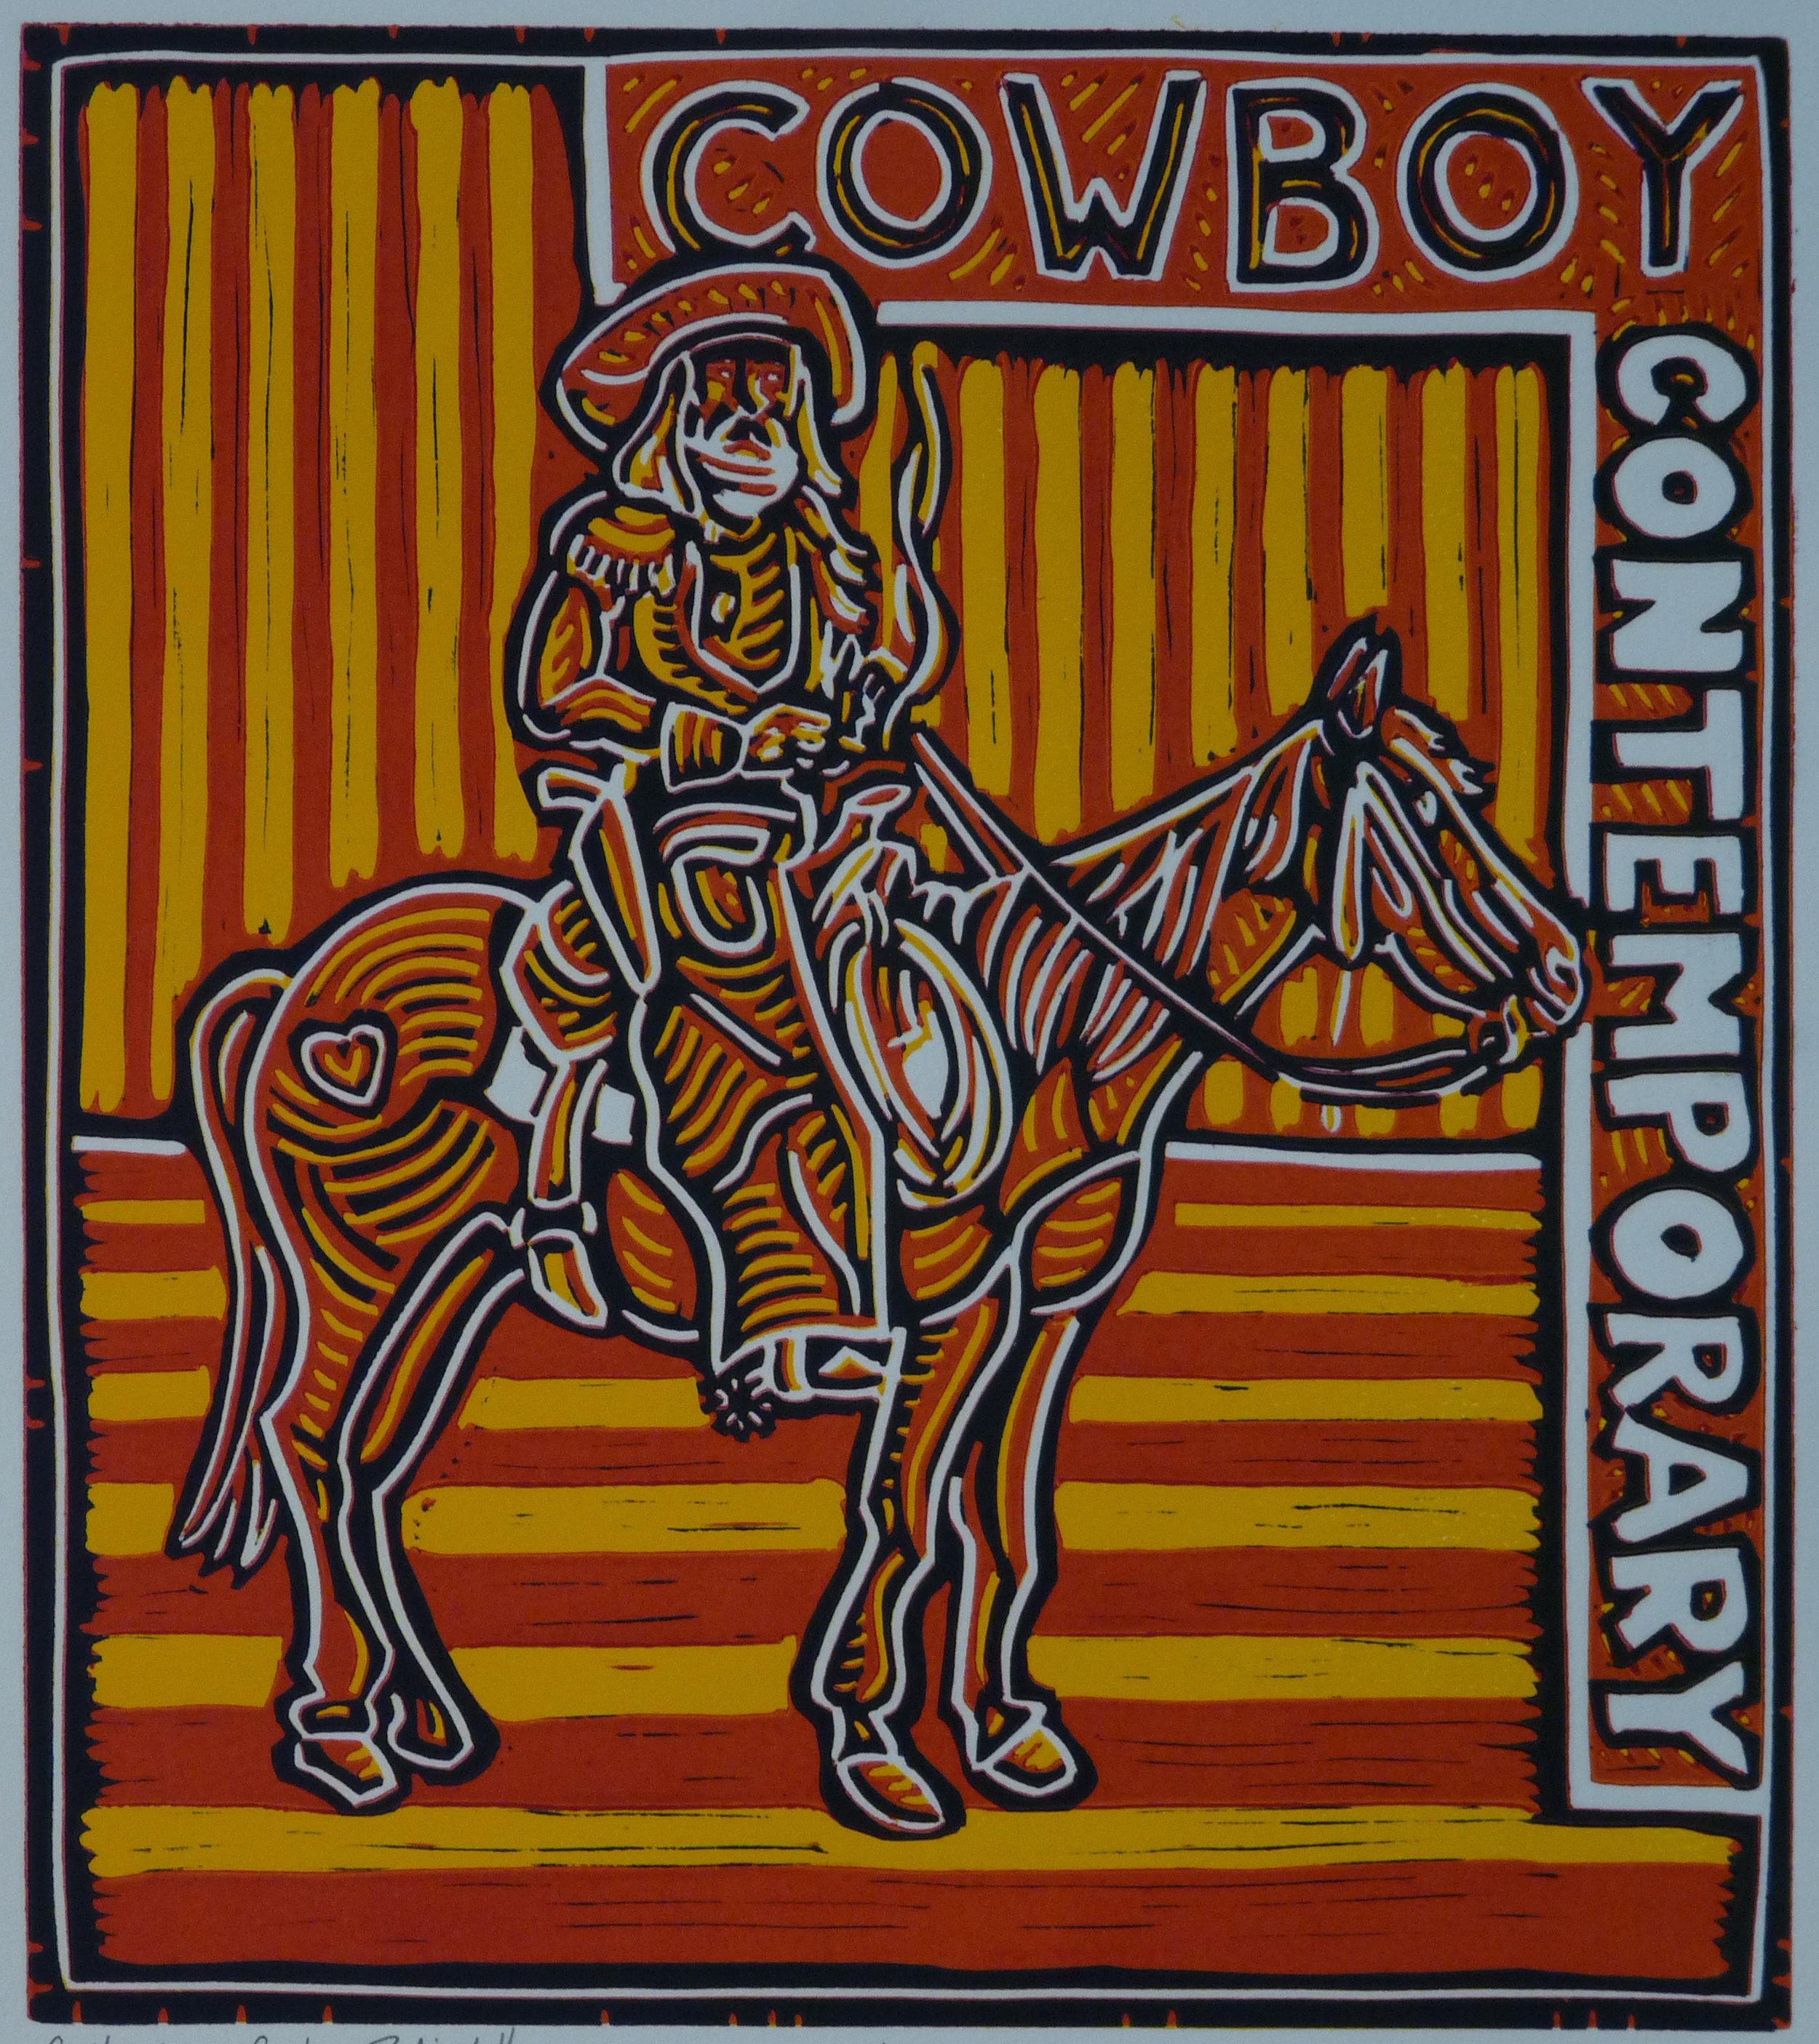 Modern Cowboy, Red & Yeller 2014